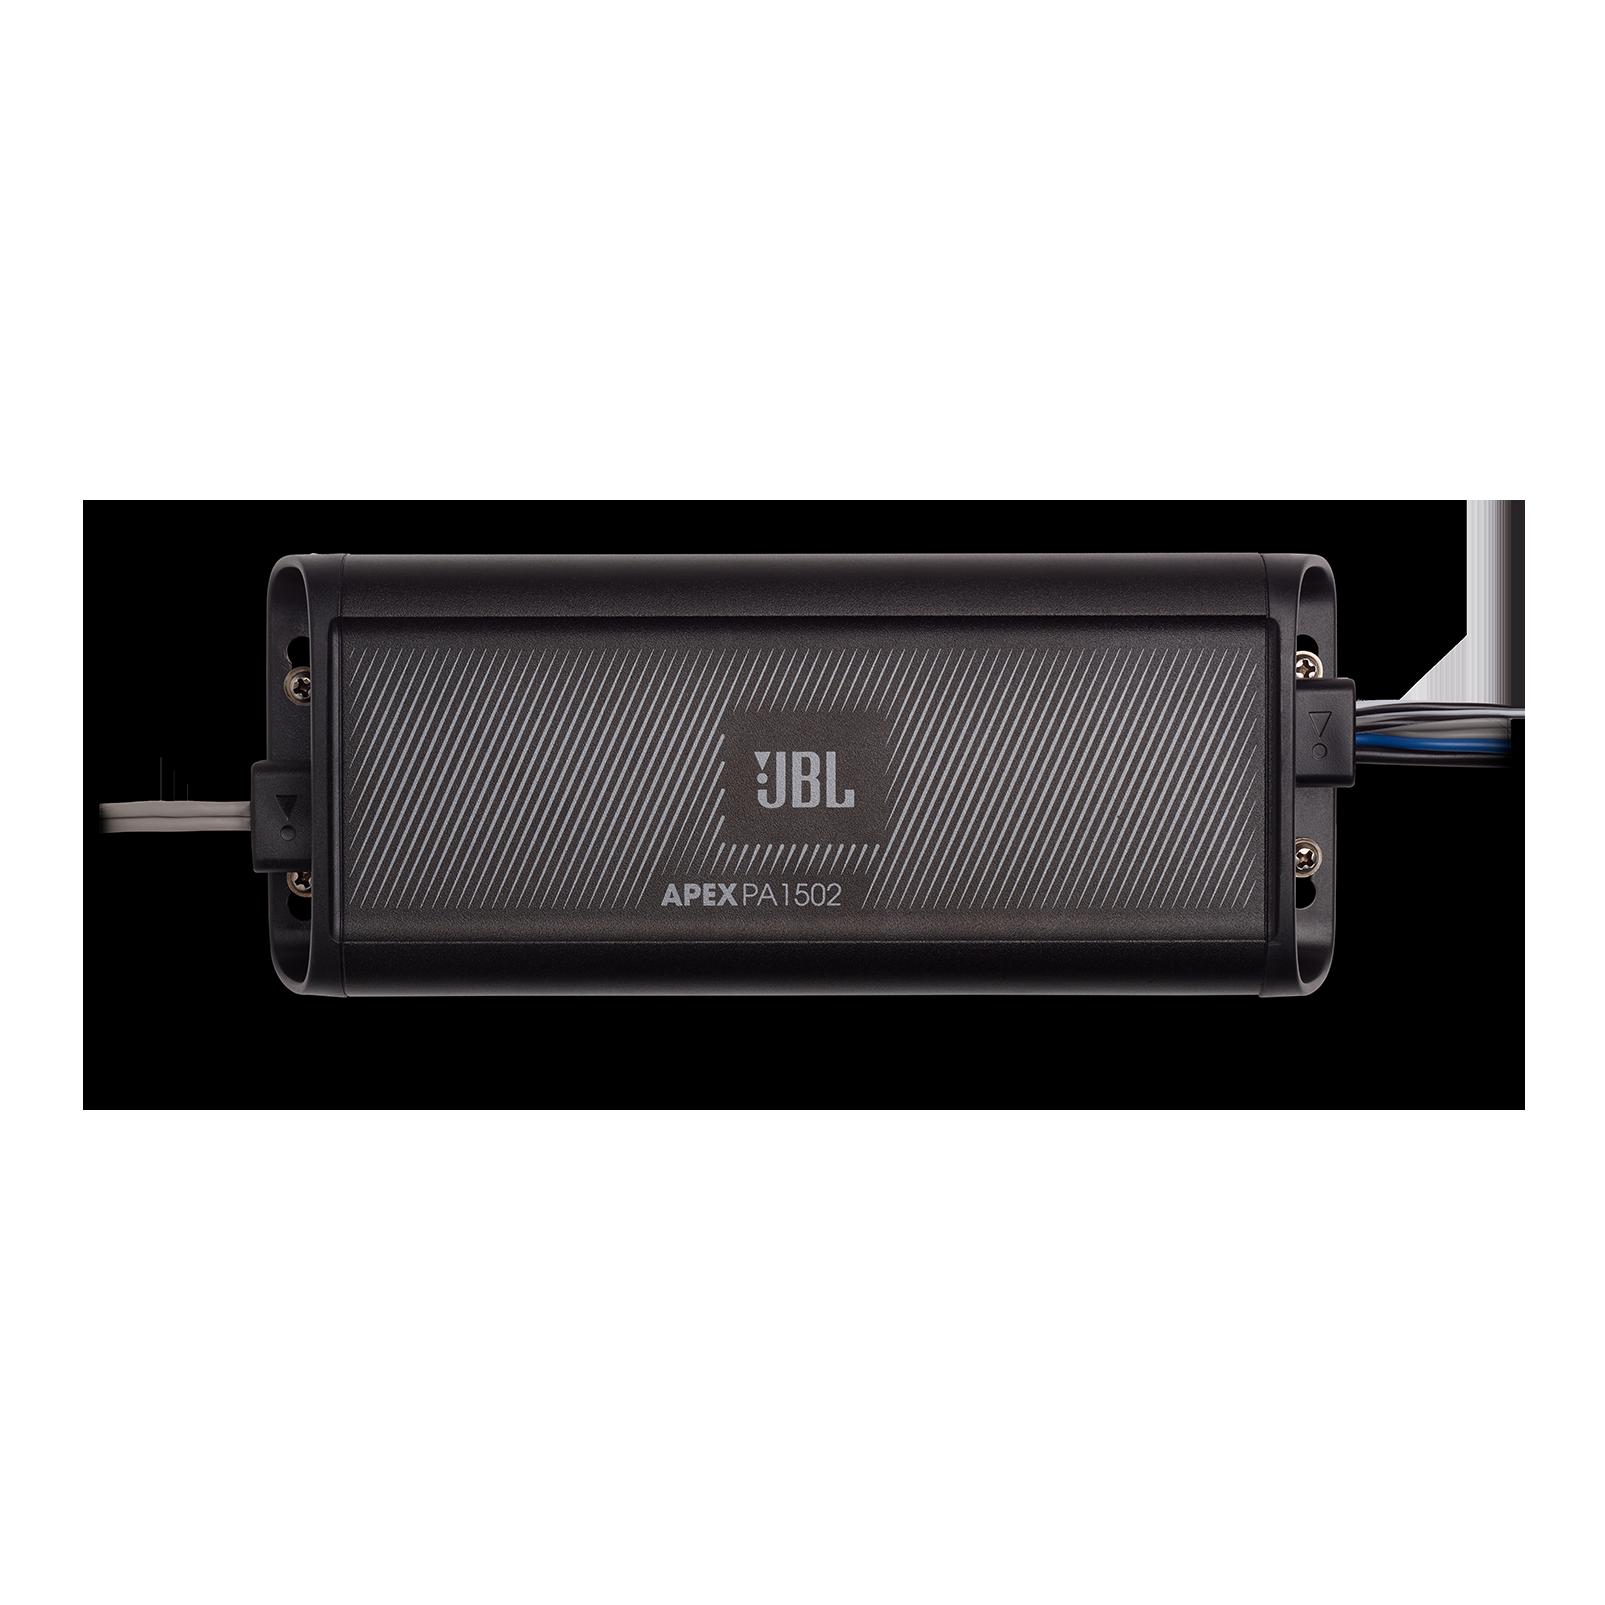 JBL Apex PA1502